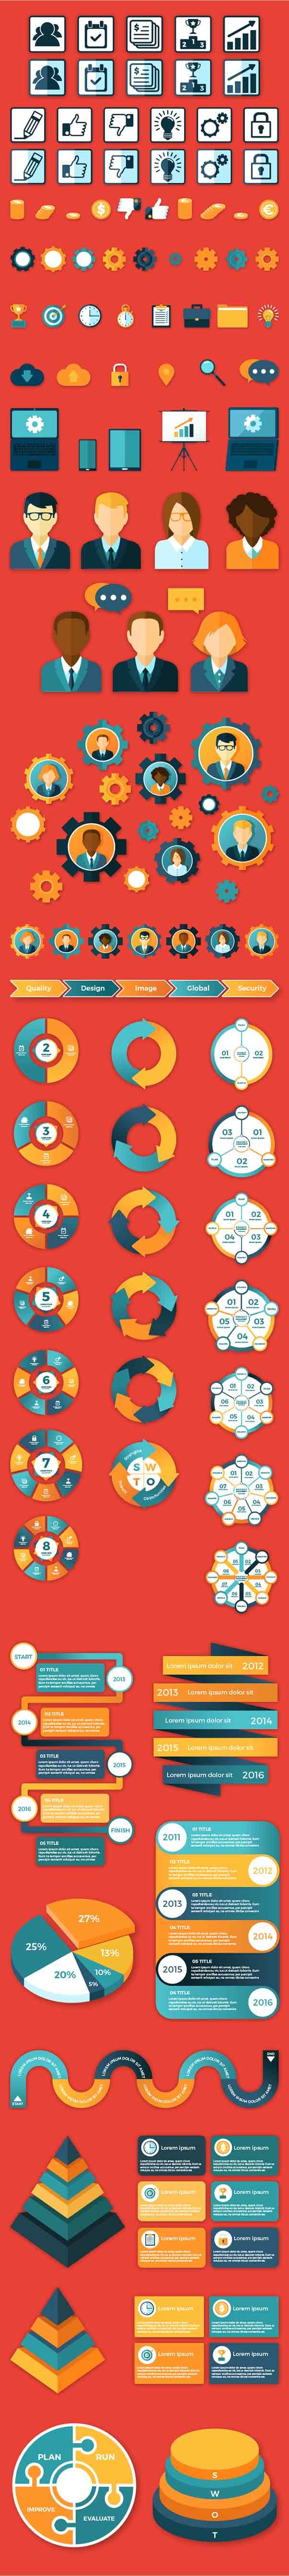 Business-Infographic-Elements-Set-1